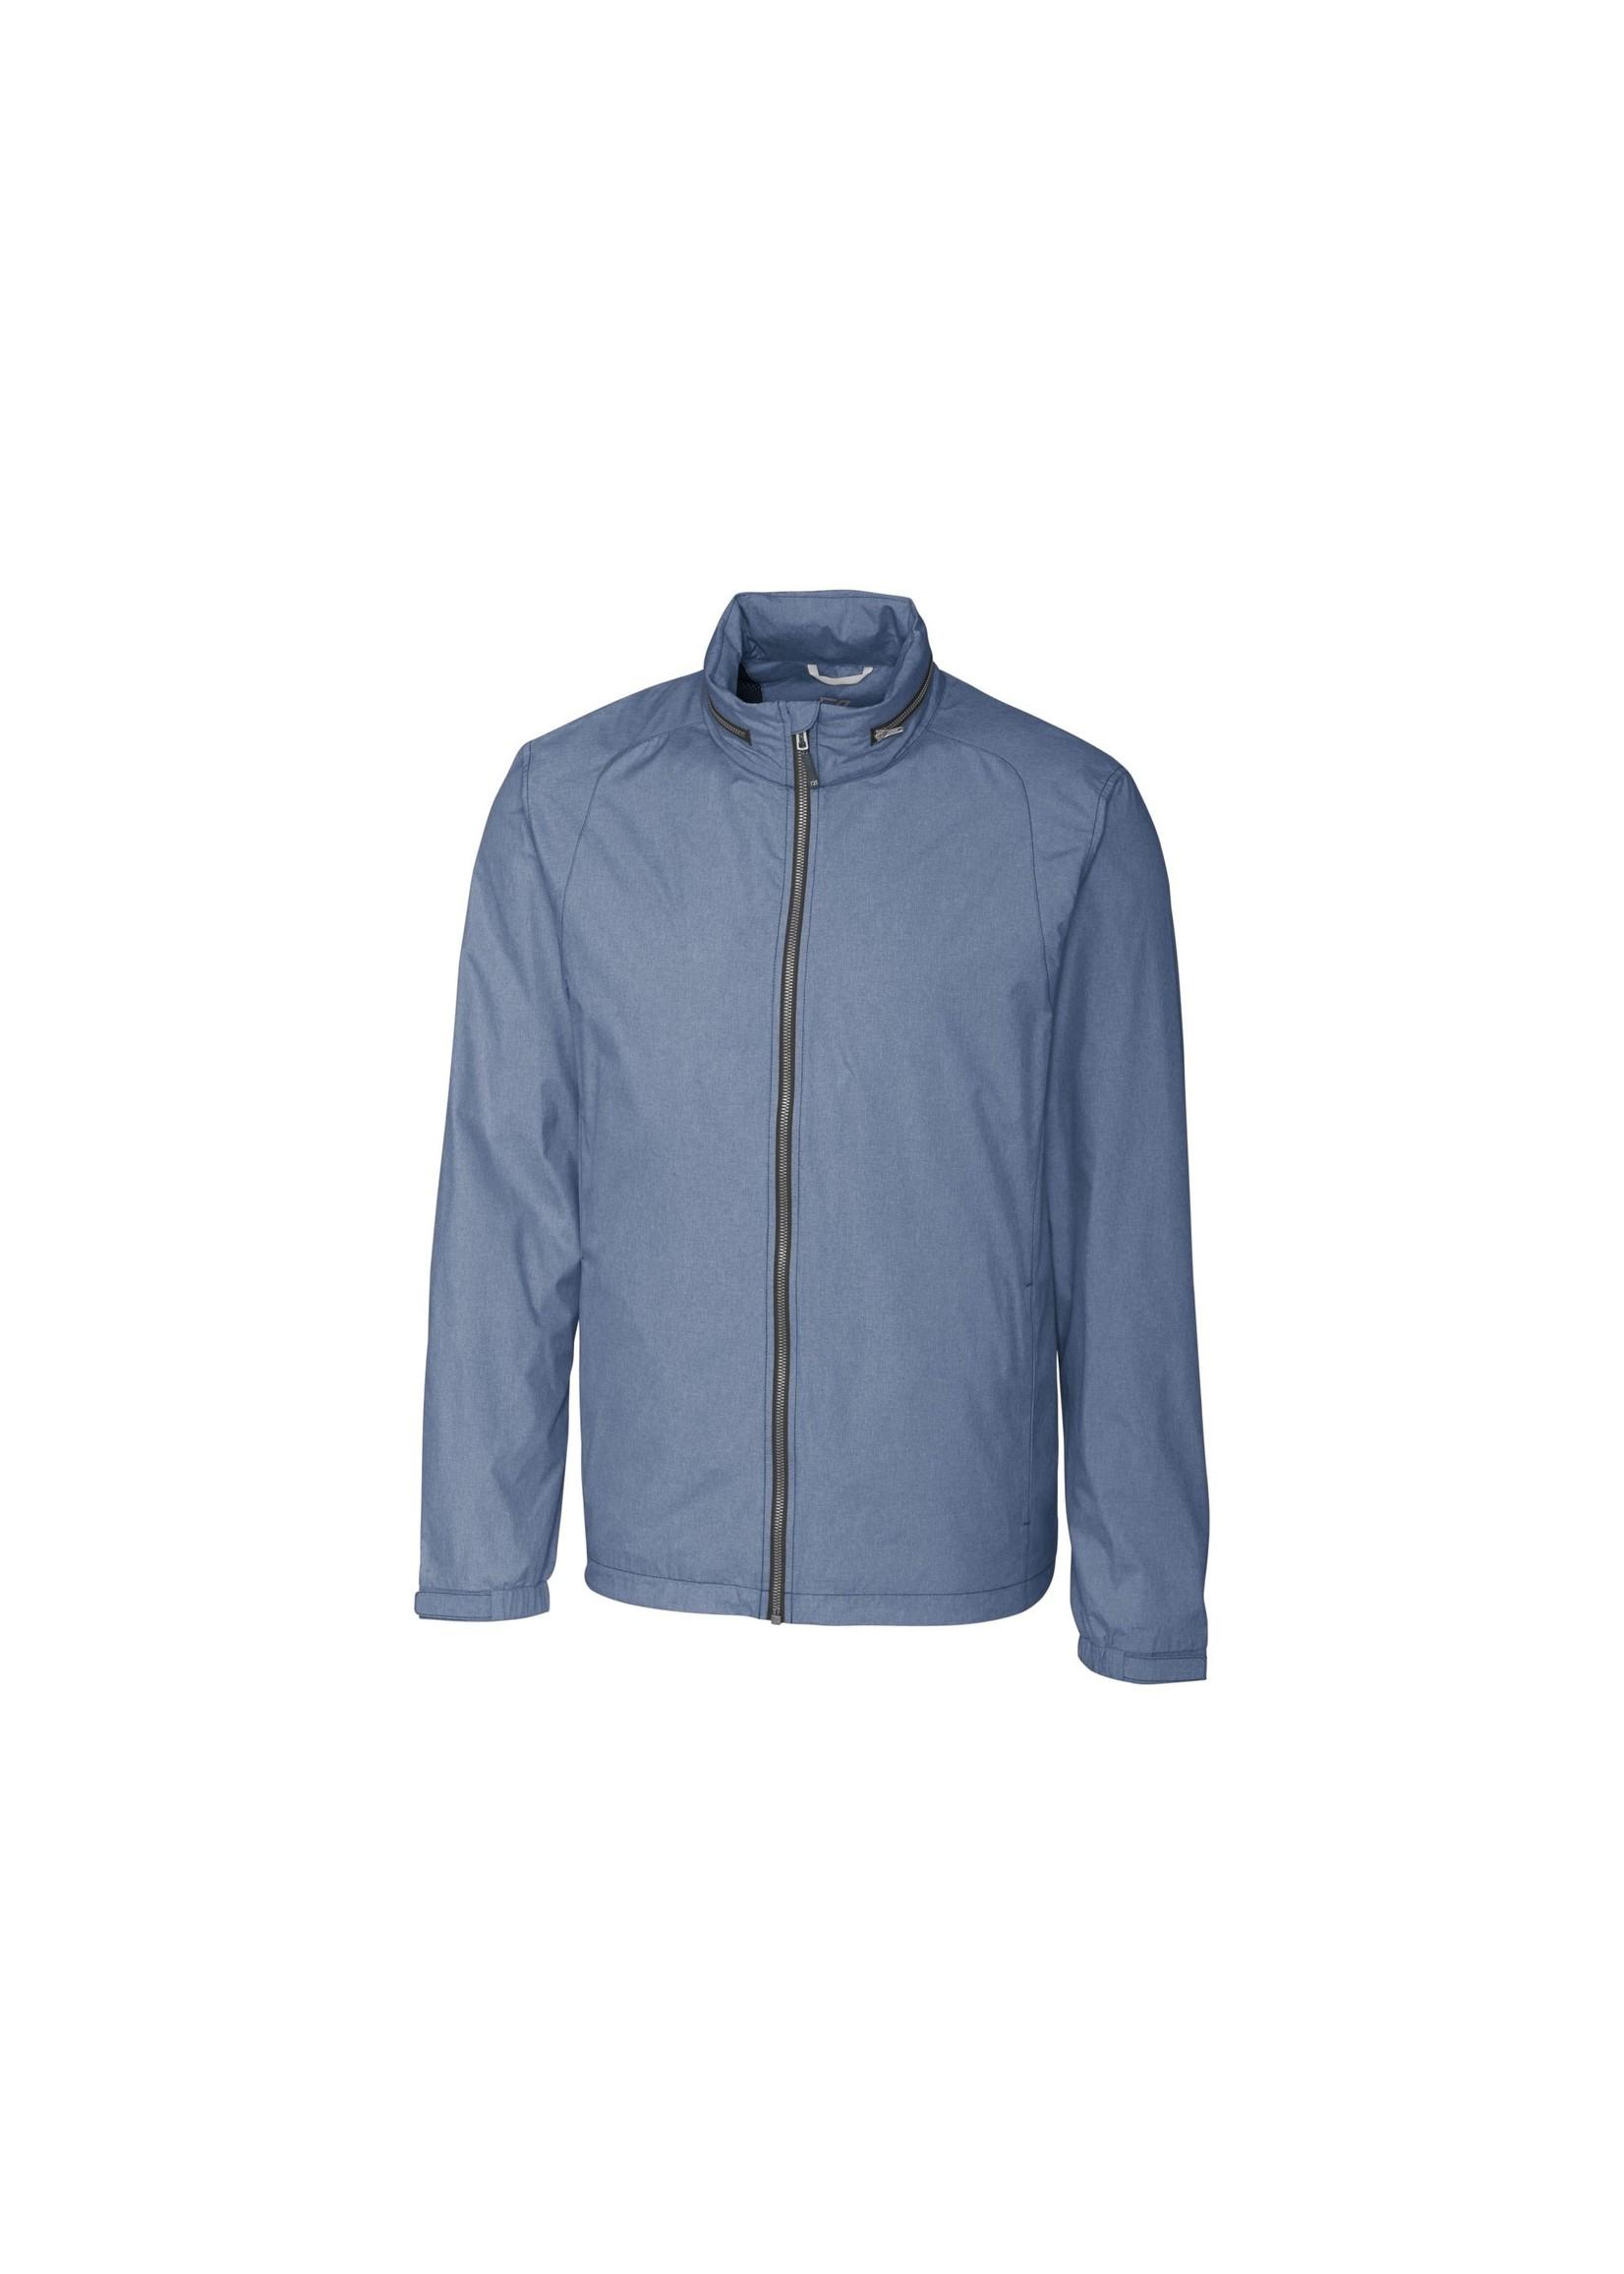 Cutter & Buck L/S  Panoramic Packable Jacket by Cutter & Buck